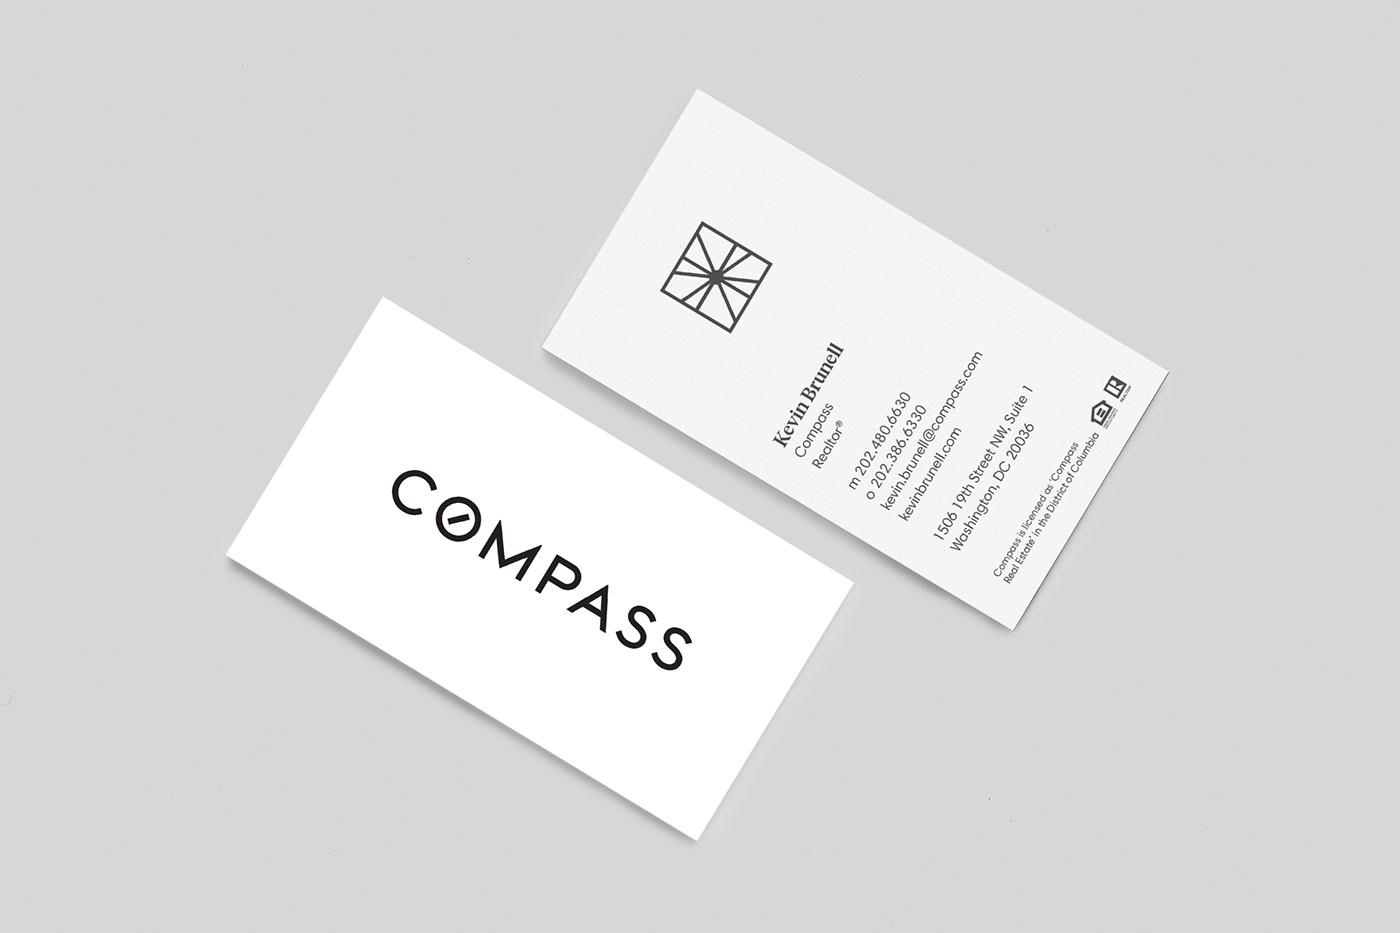 compass business cards - Dorit.mercatodos.co